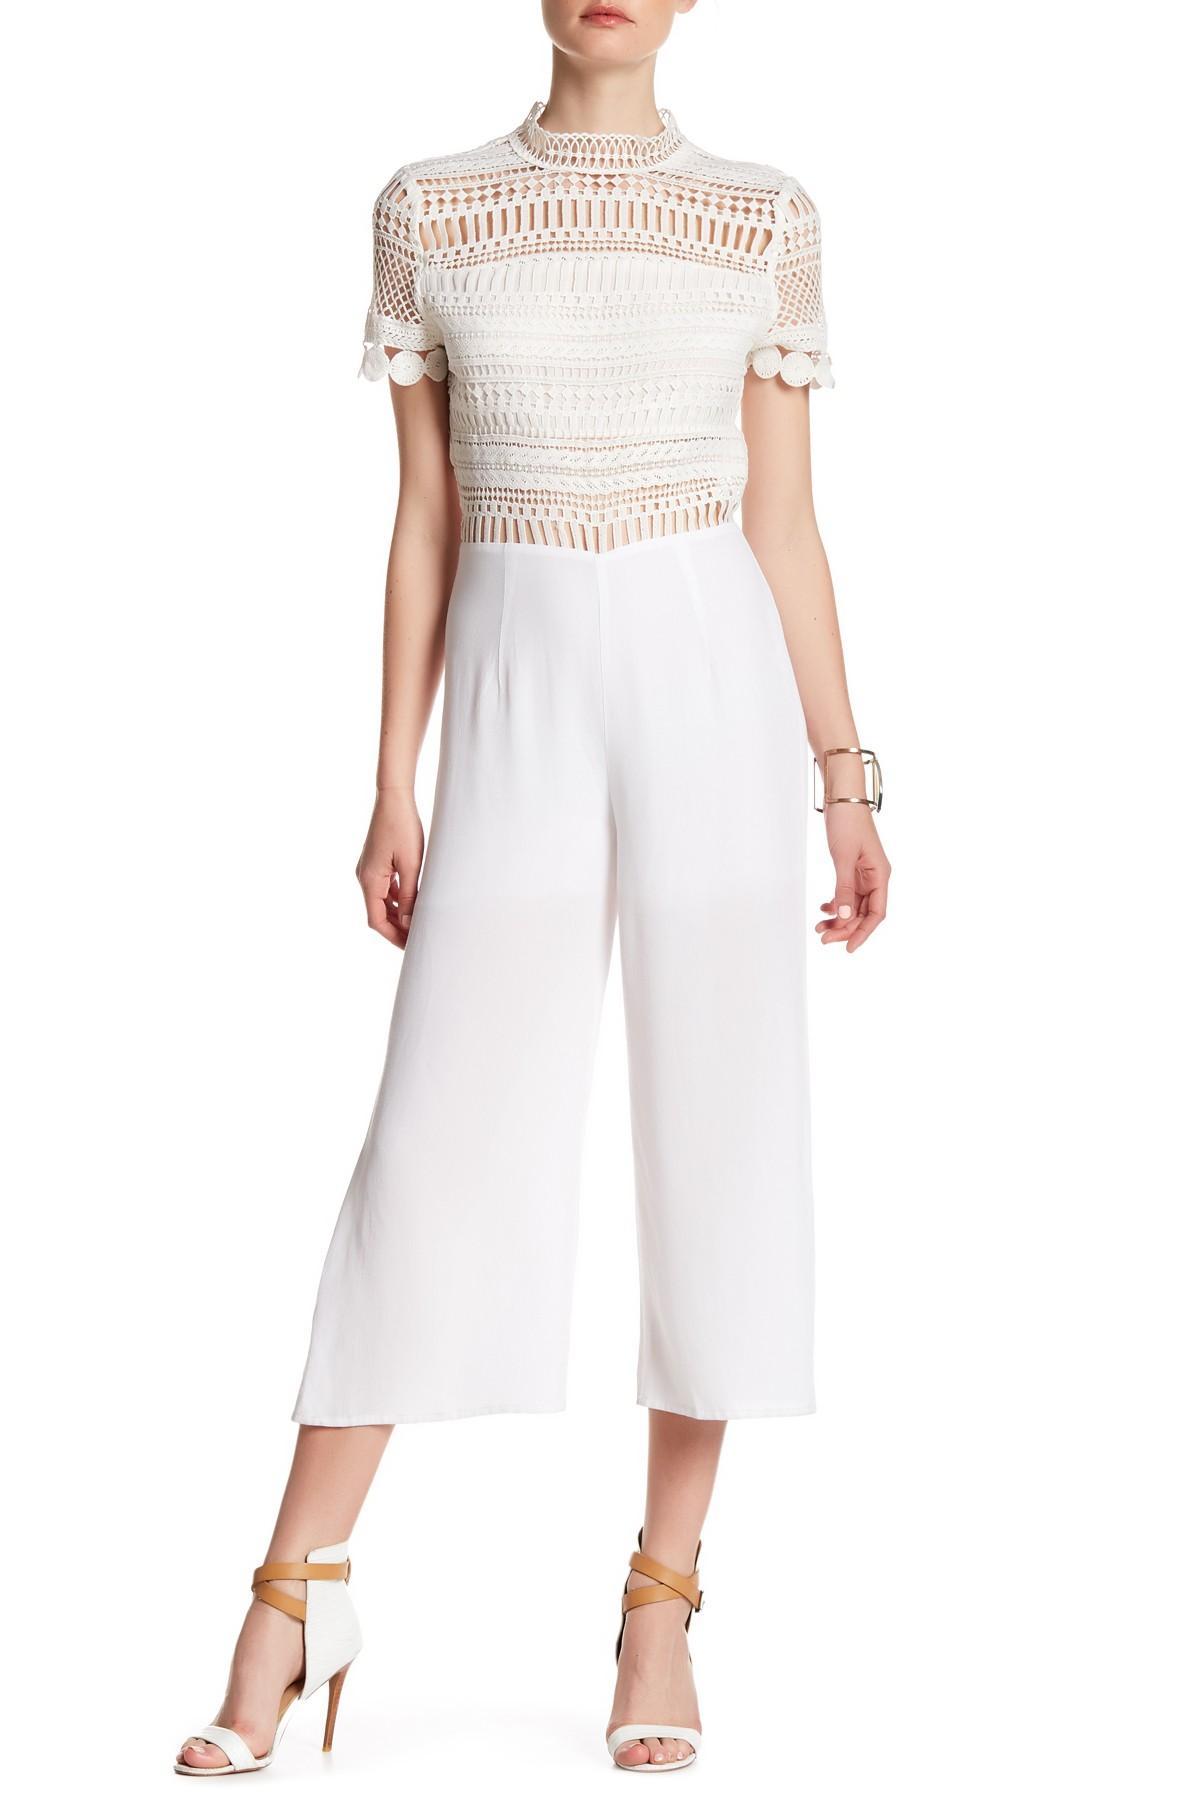 de291d320c7 Lyst - Blu Pepper Crochet Lace Jumpsuit in White